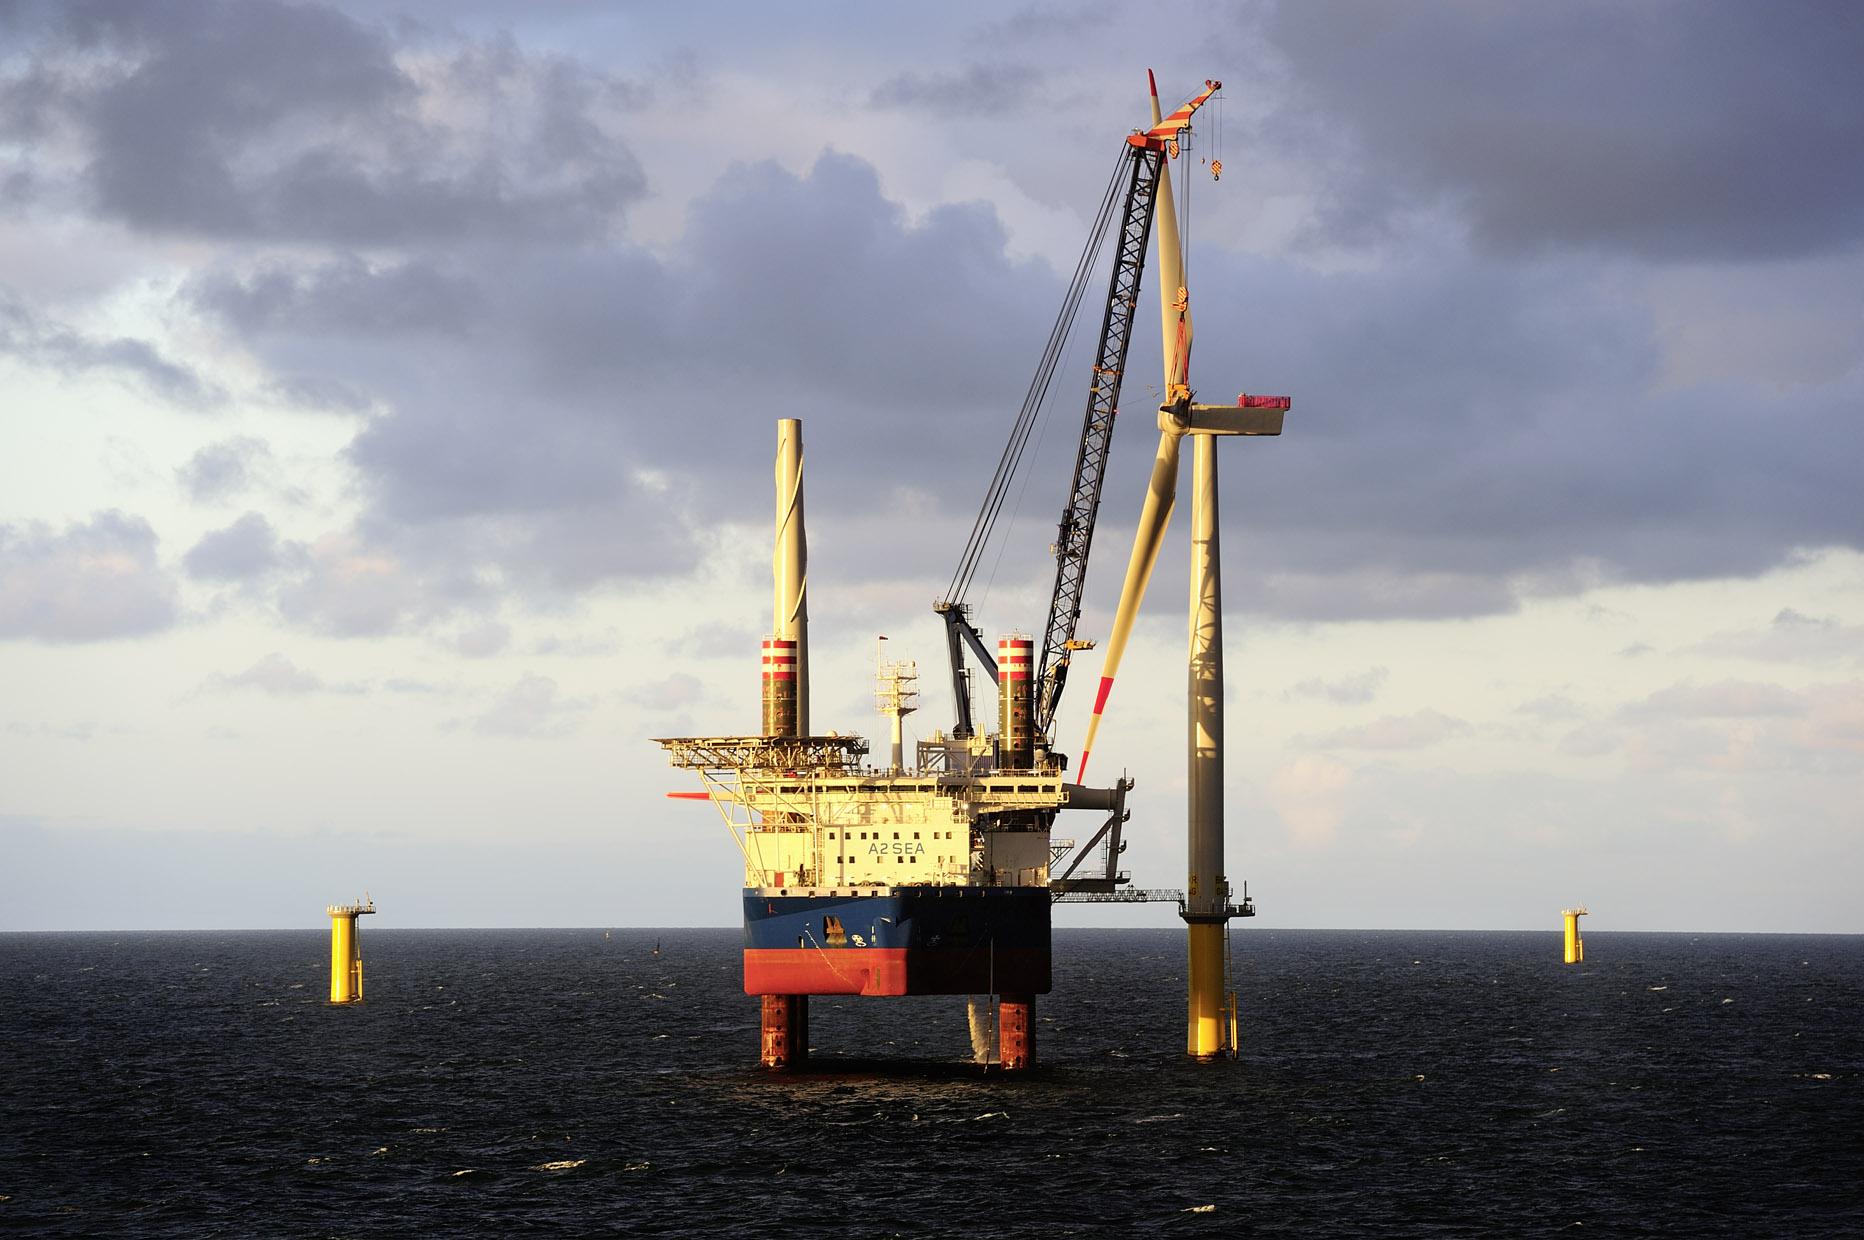 BKR1-First-turbine-installation / Pressebild: DONG Energy